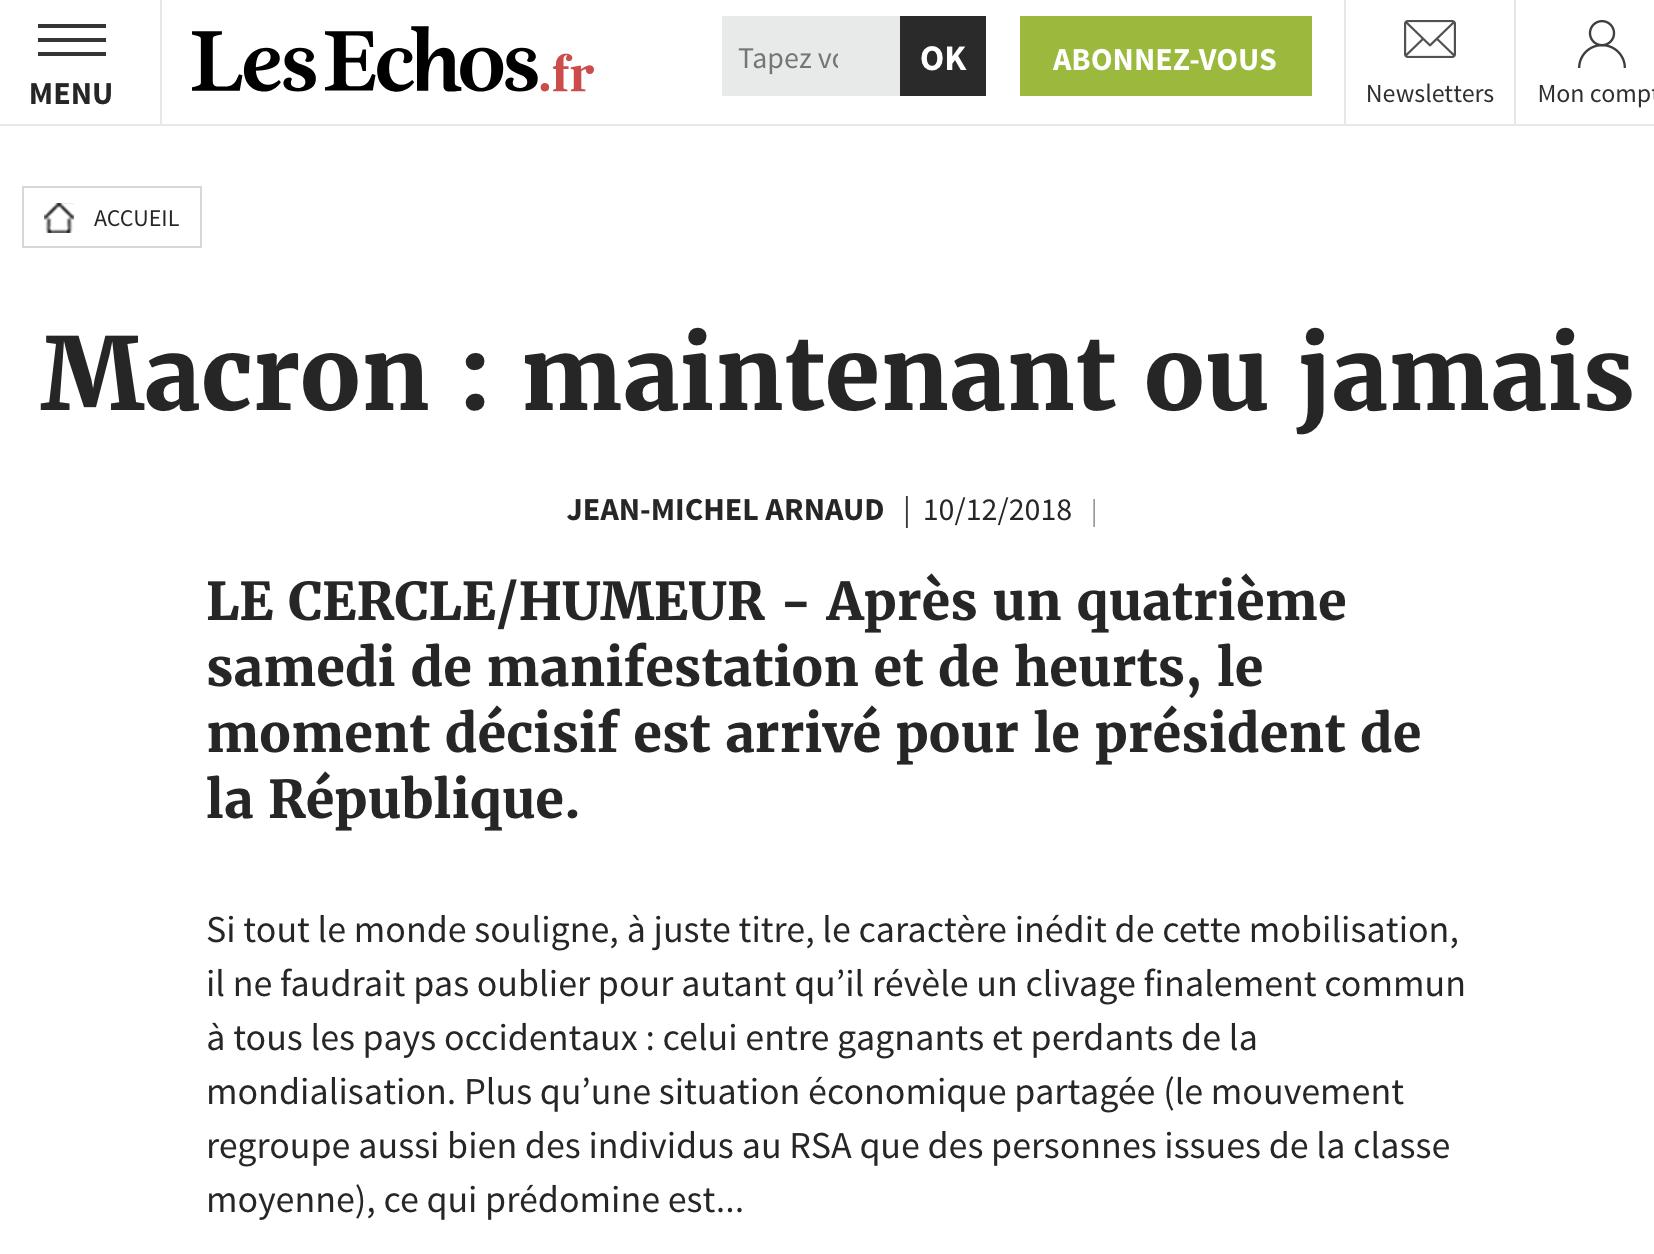 Macron : maintenant ou jamais